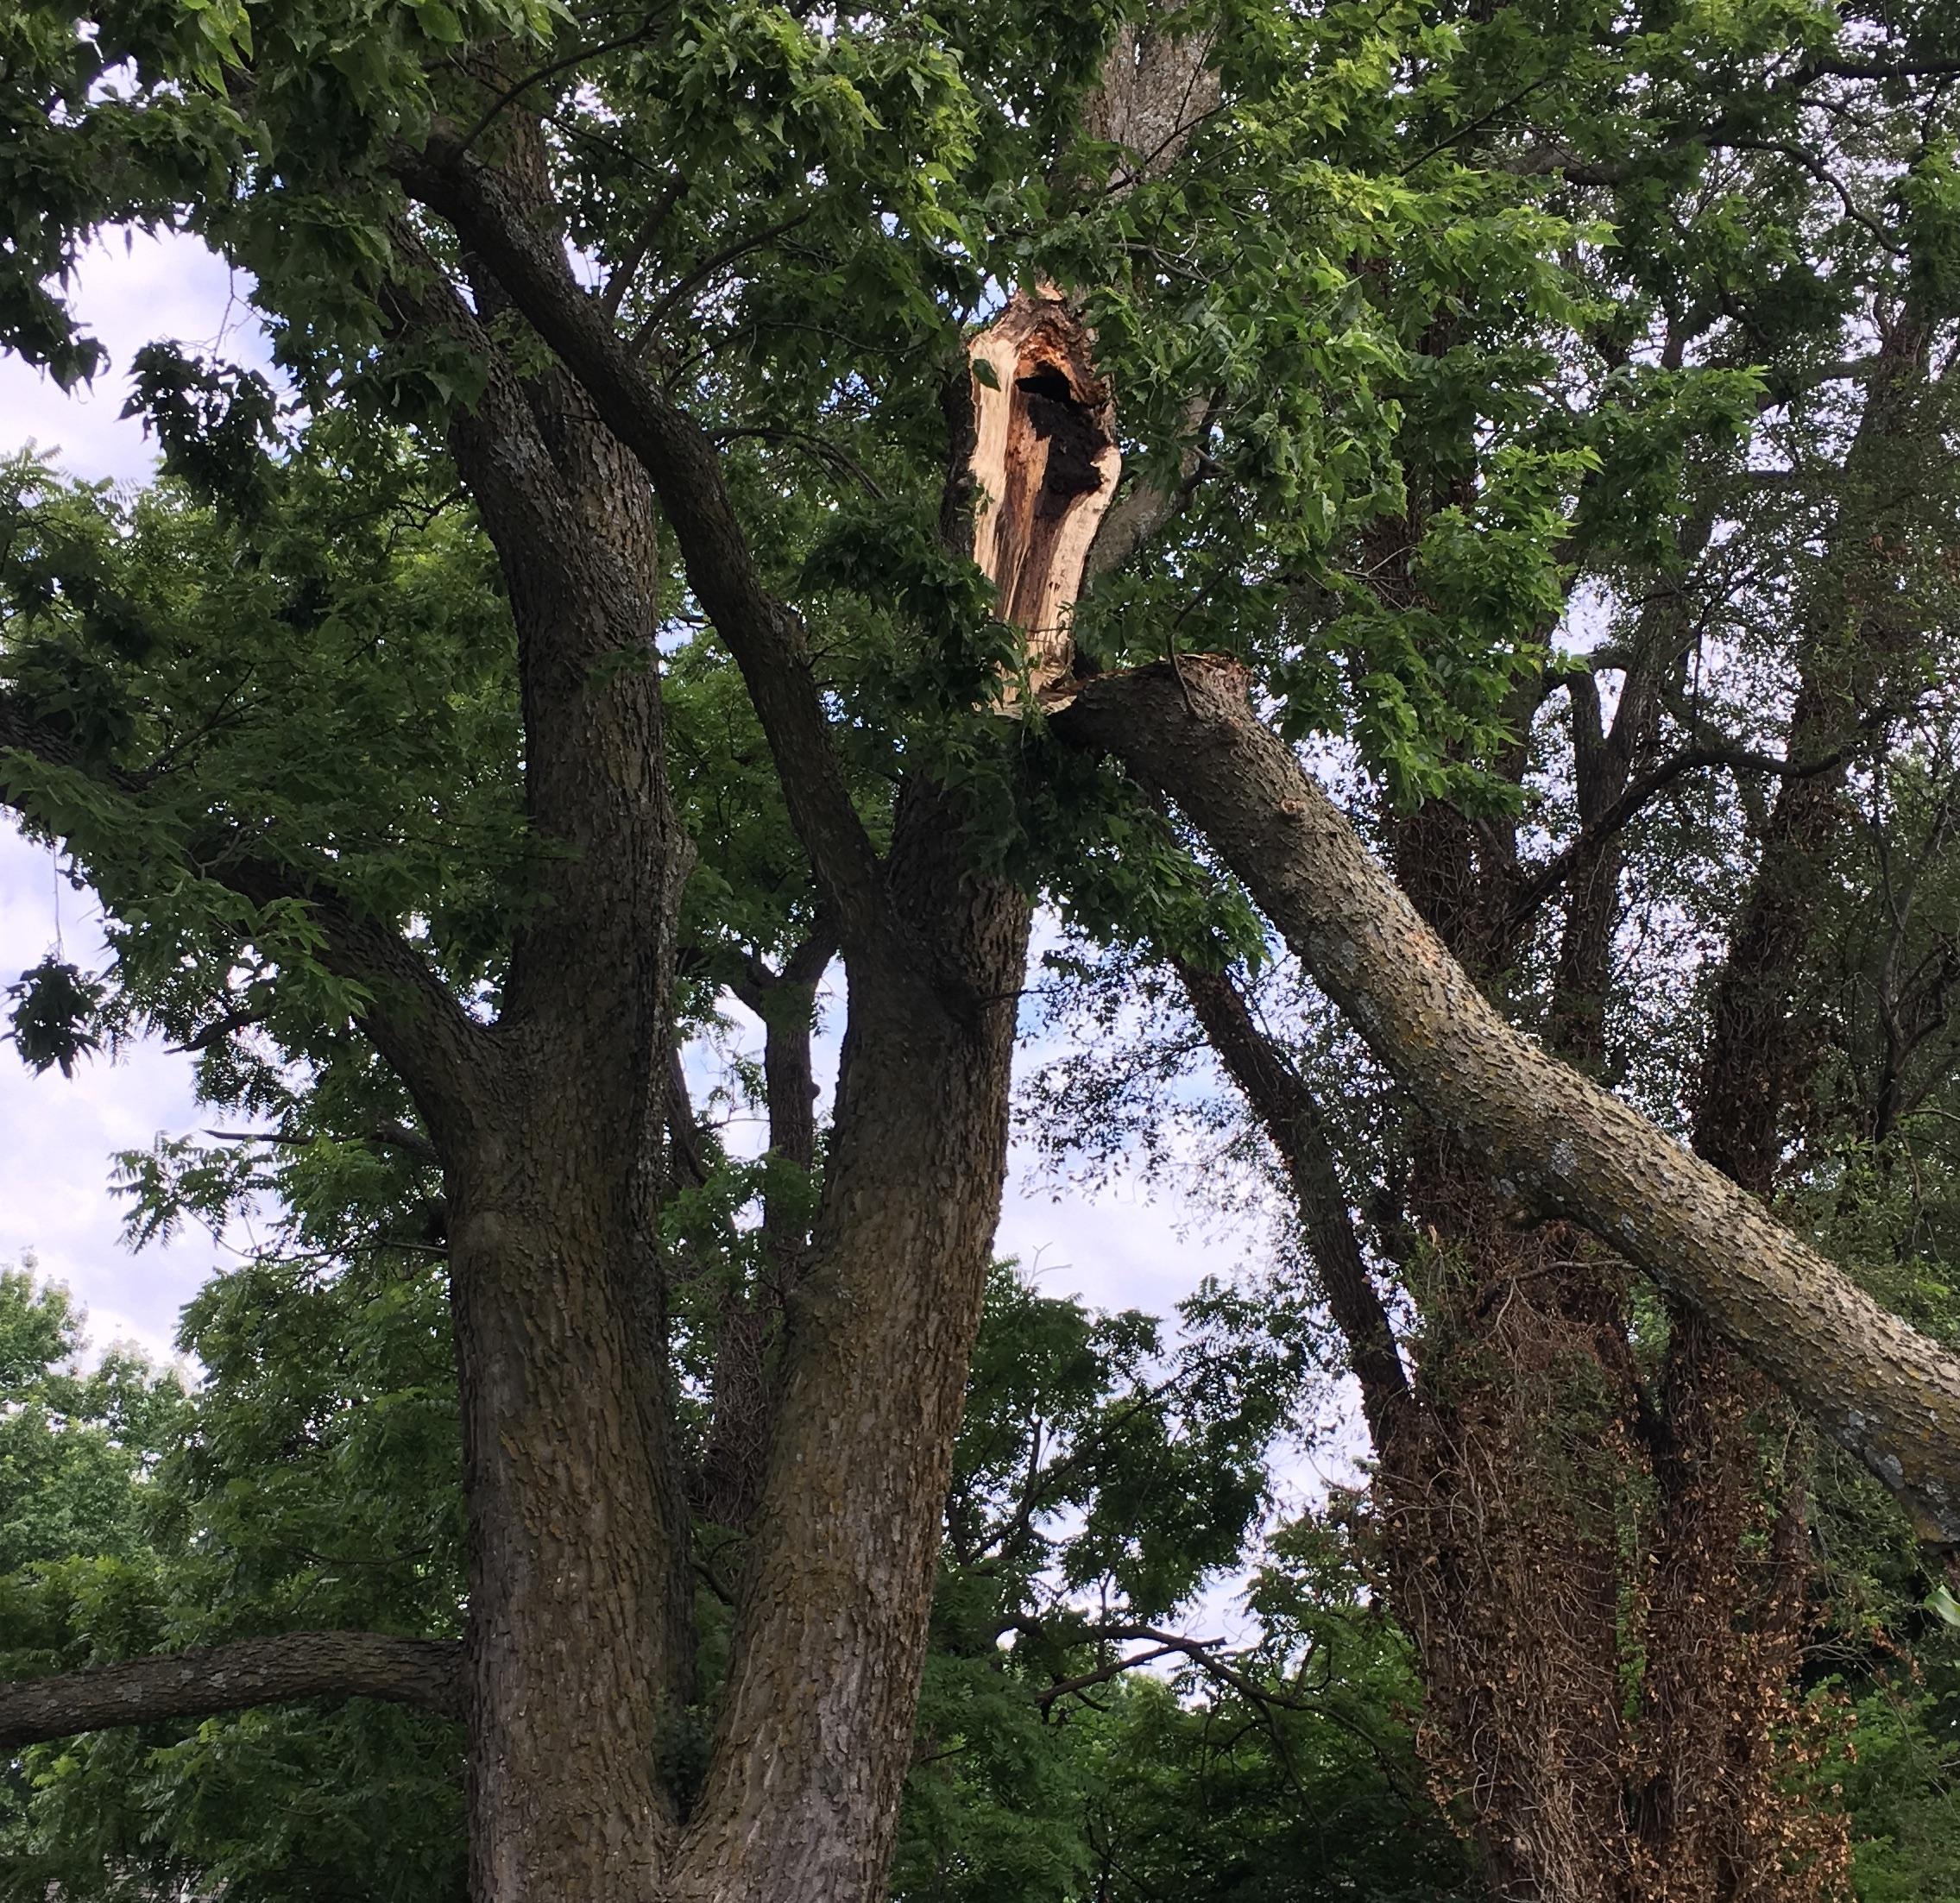 Hole in tree creates weakness